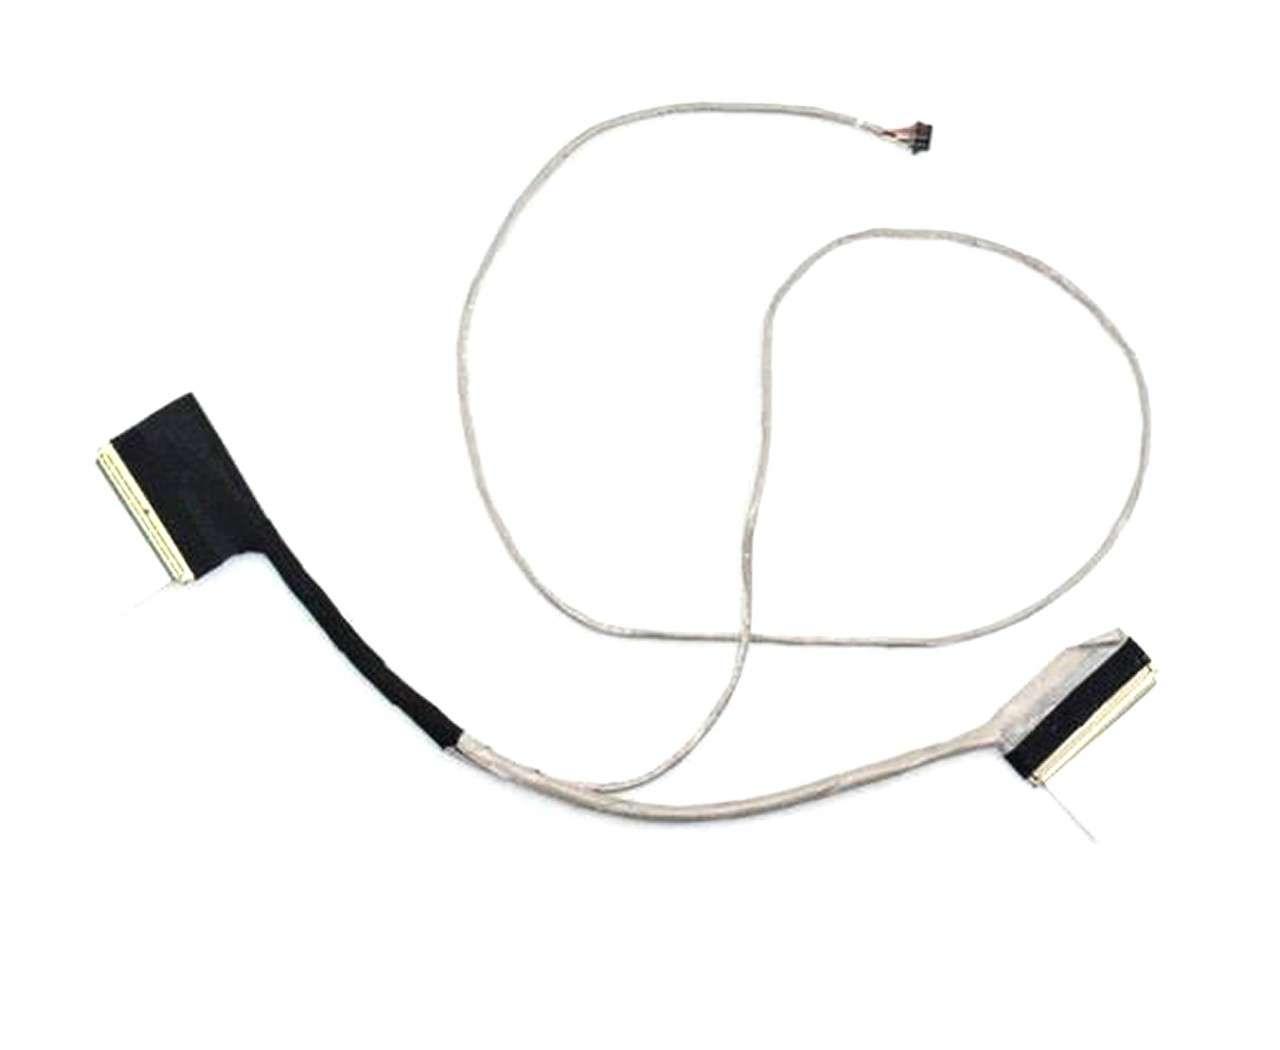 Cablu video LVDS Asus X403M imagine powerlaptop.ro 2021